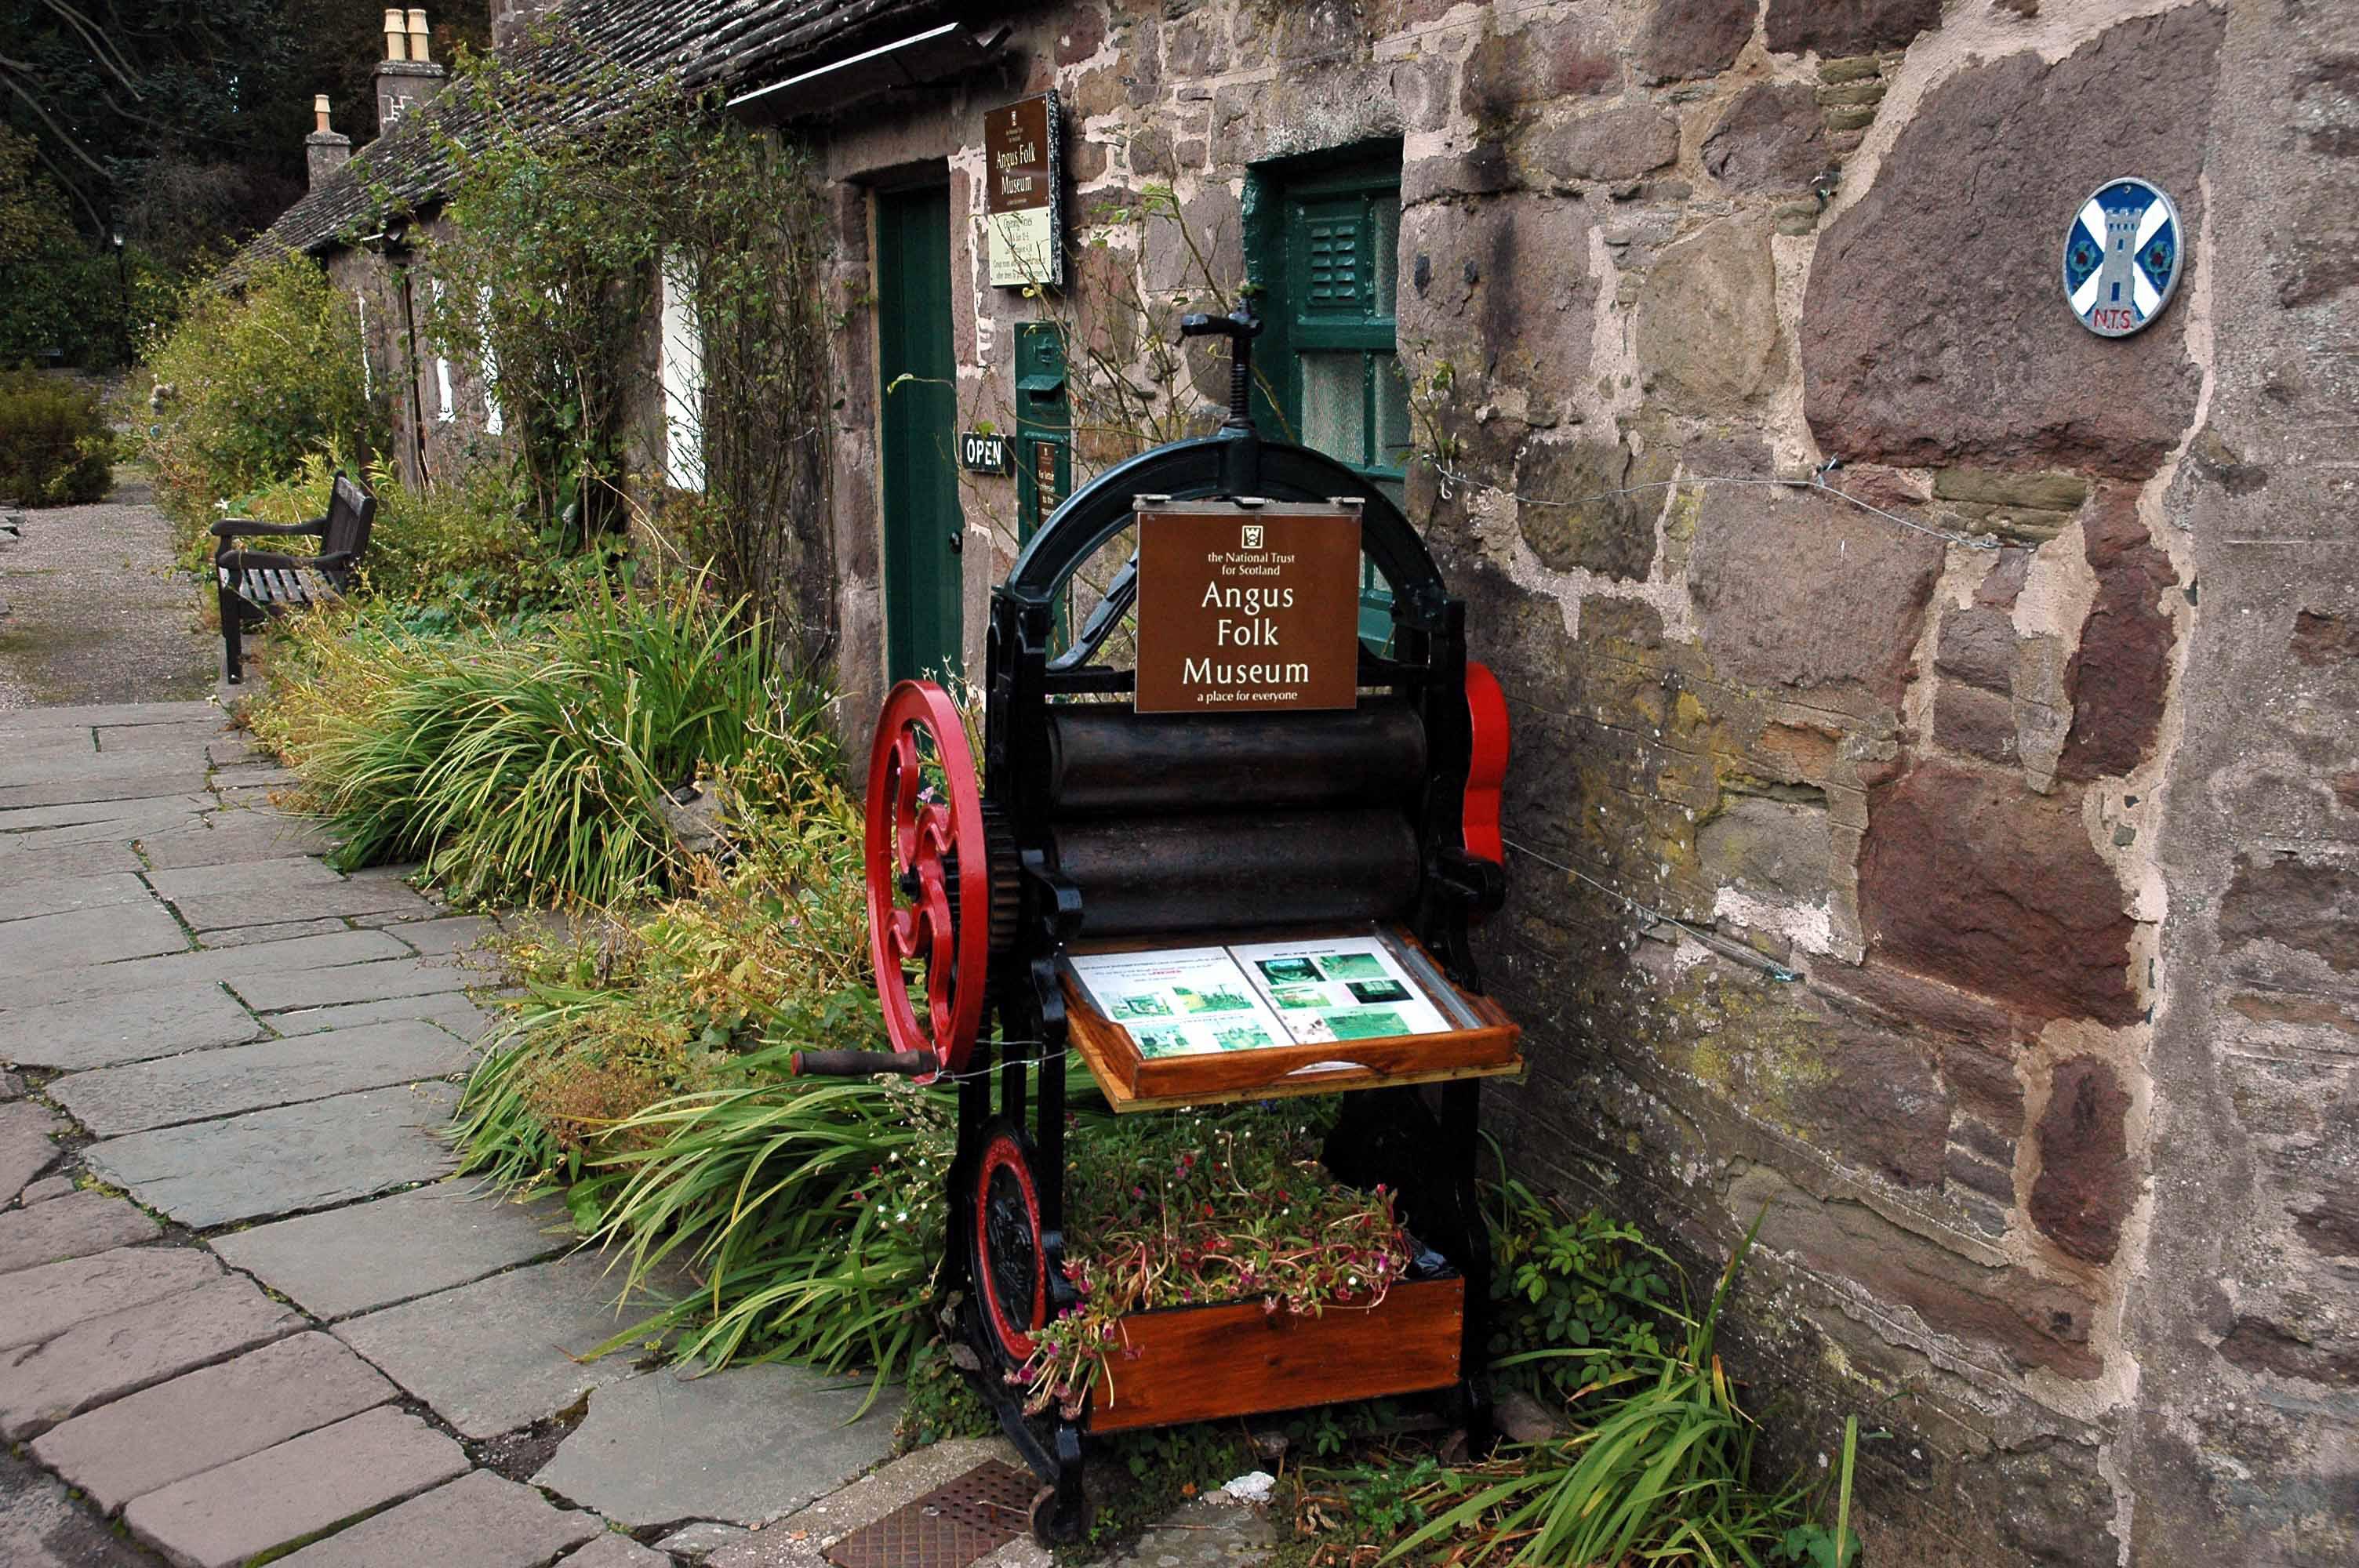 Angus Folk Museum.